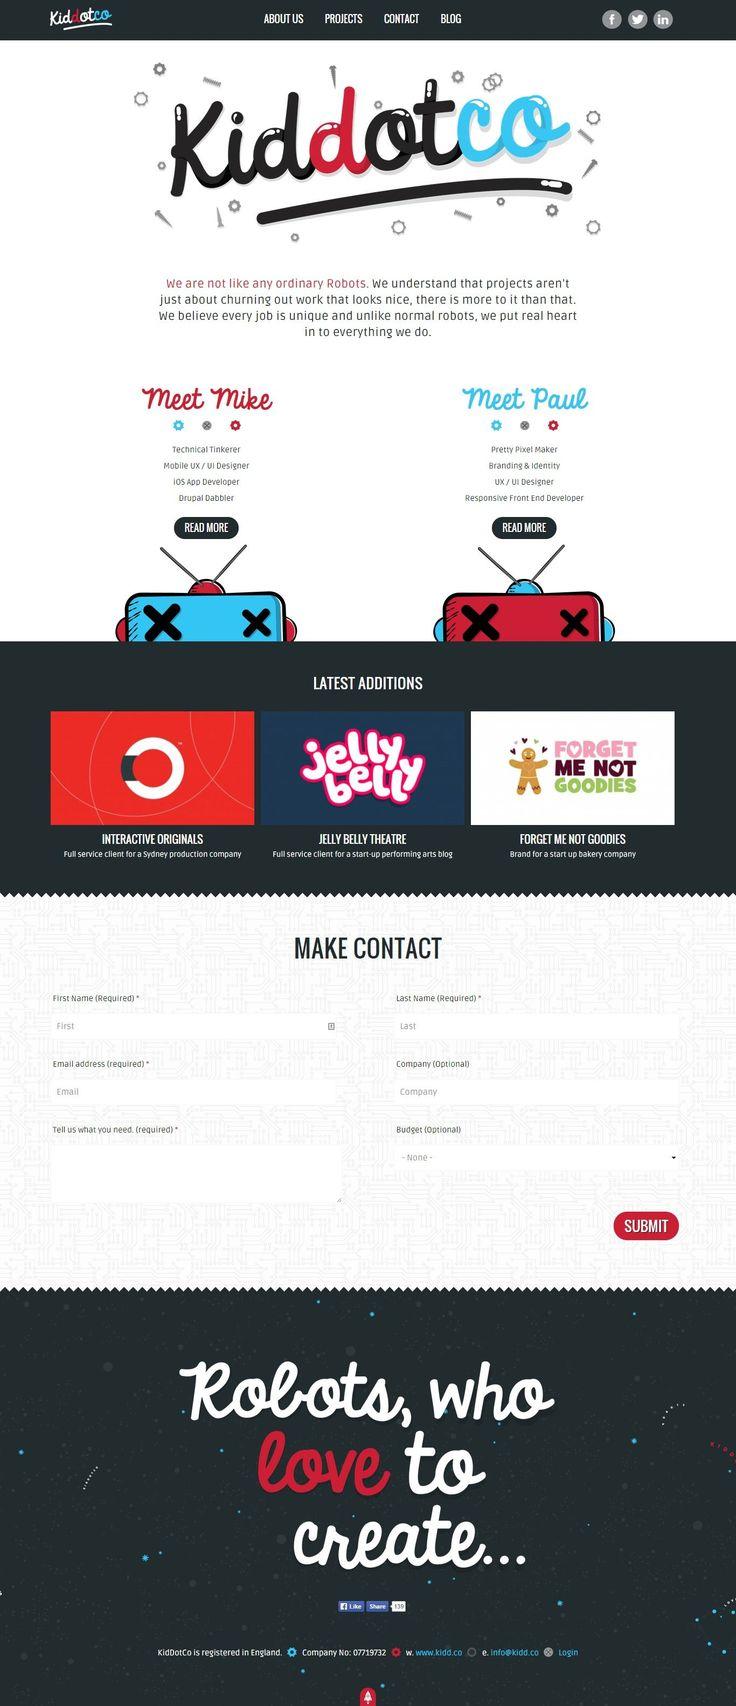 KidDotCo http://flattrendz.com/flat-design-gallery/kiddotco/